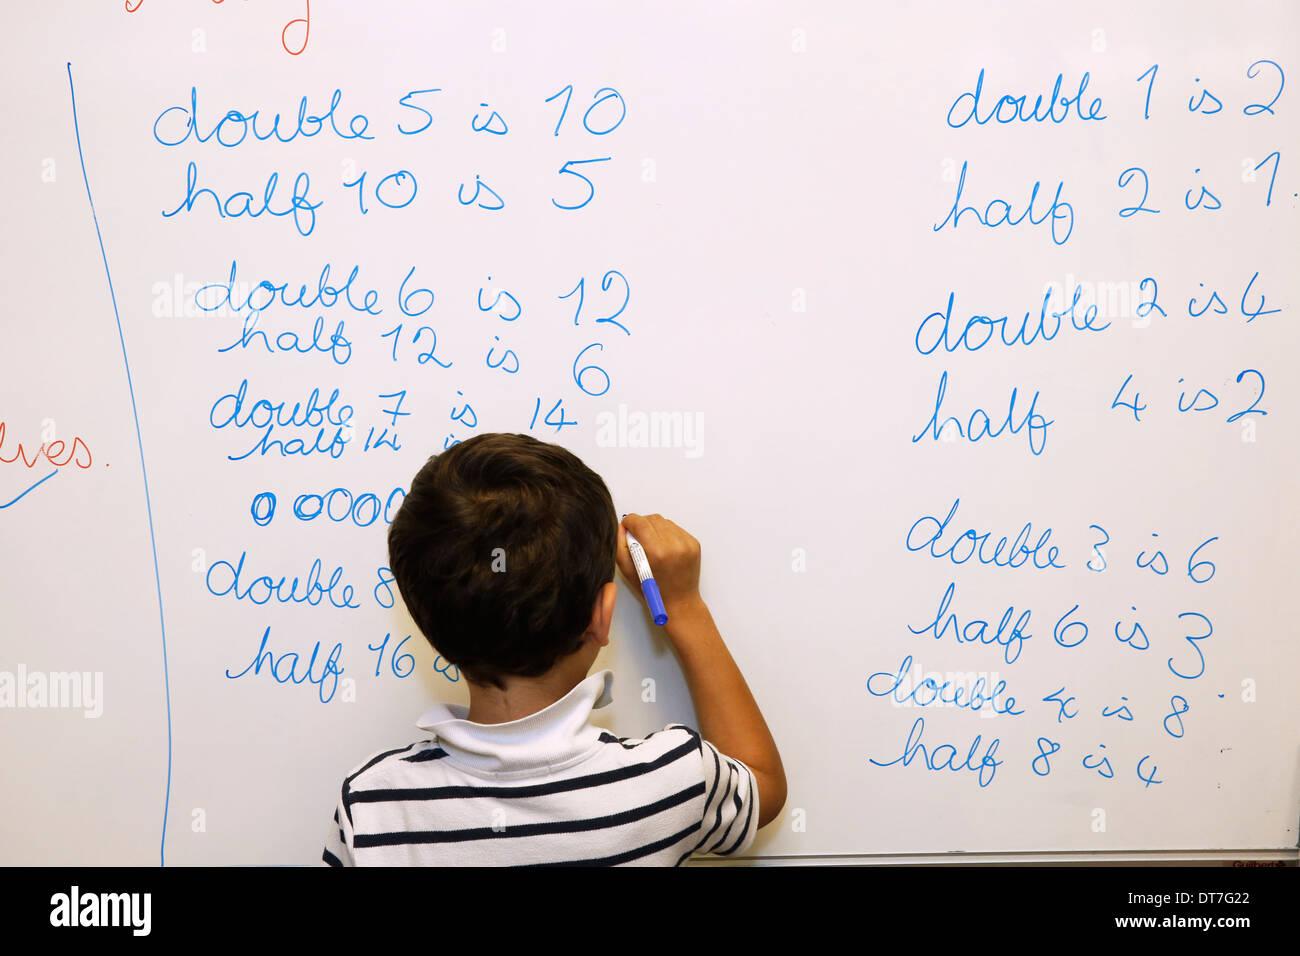 Secondary school - Stock Image